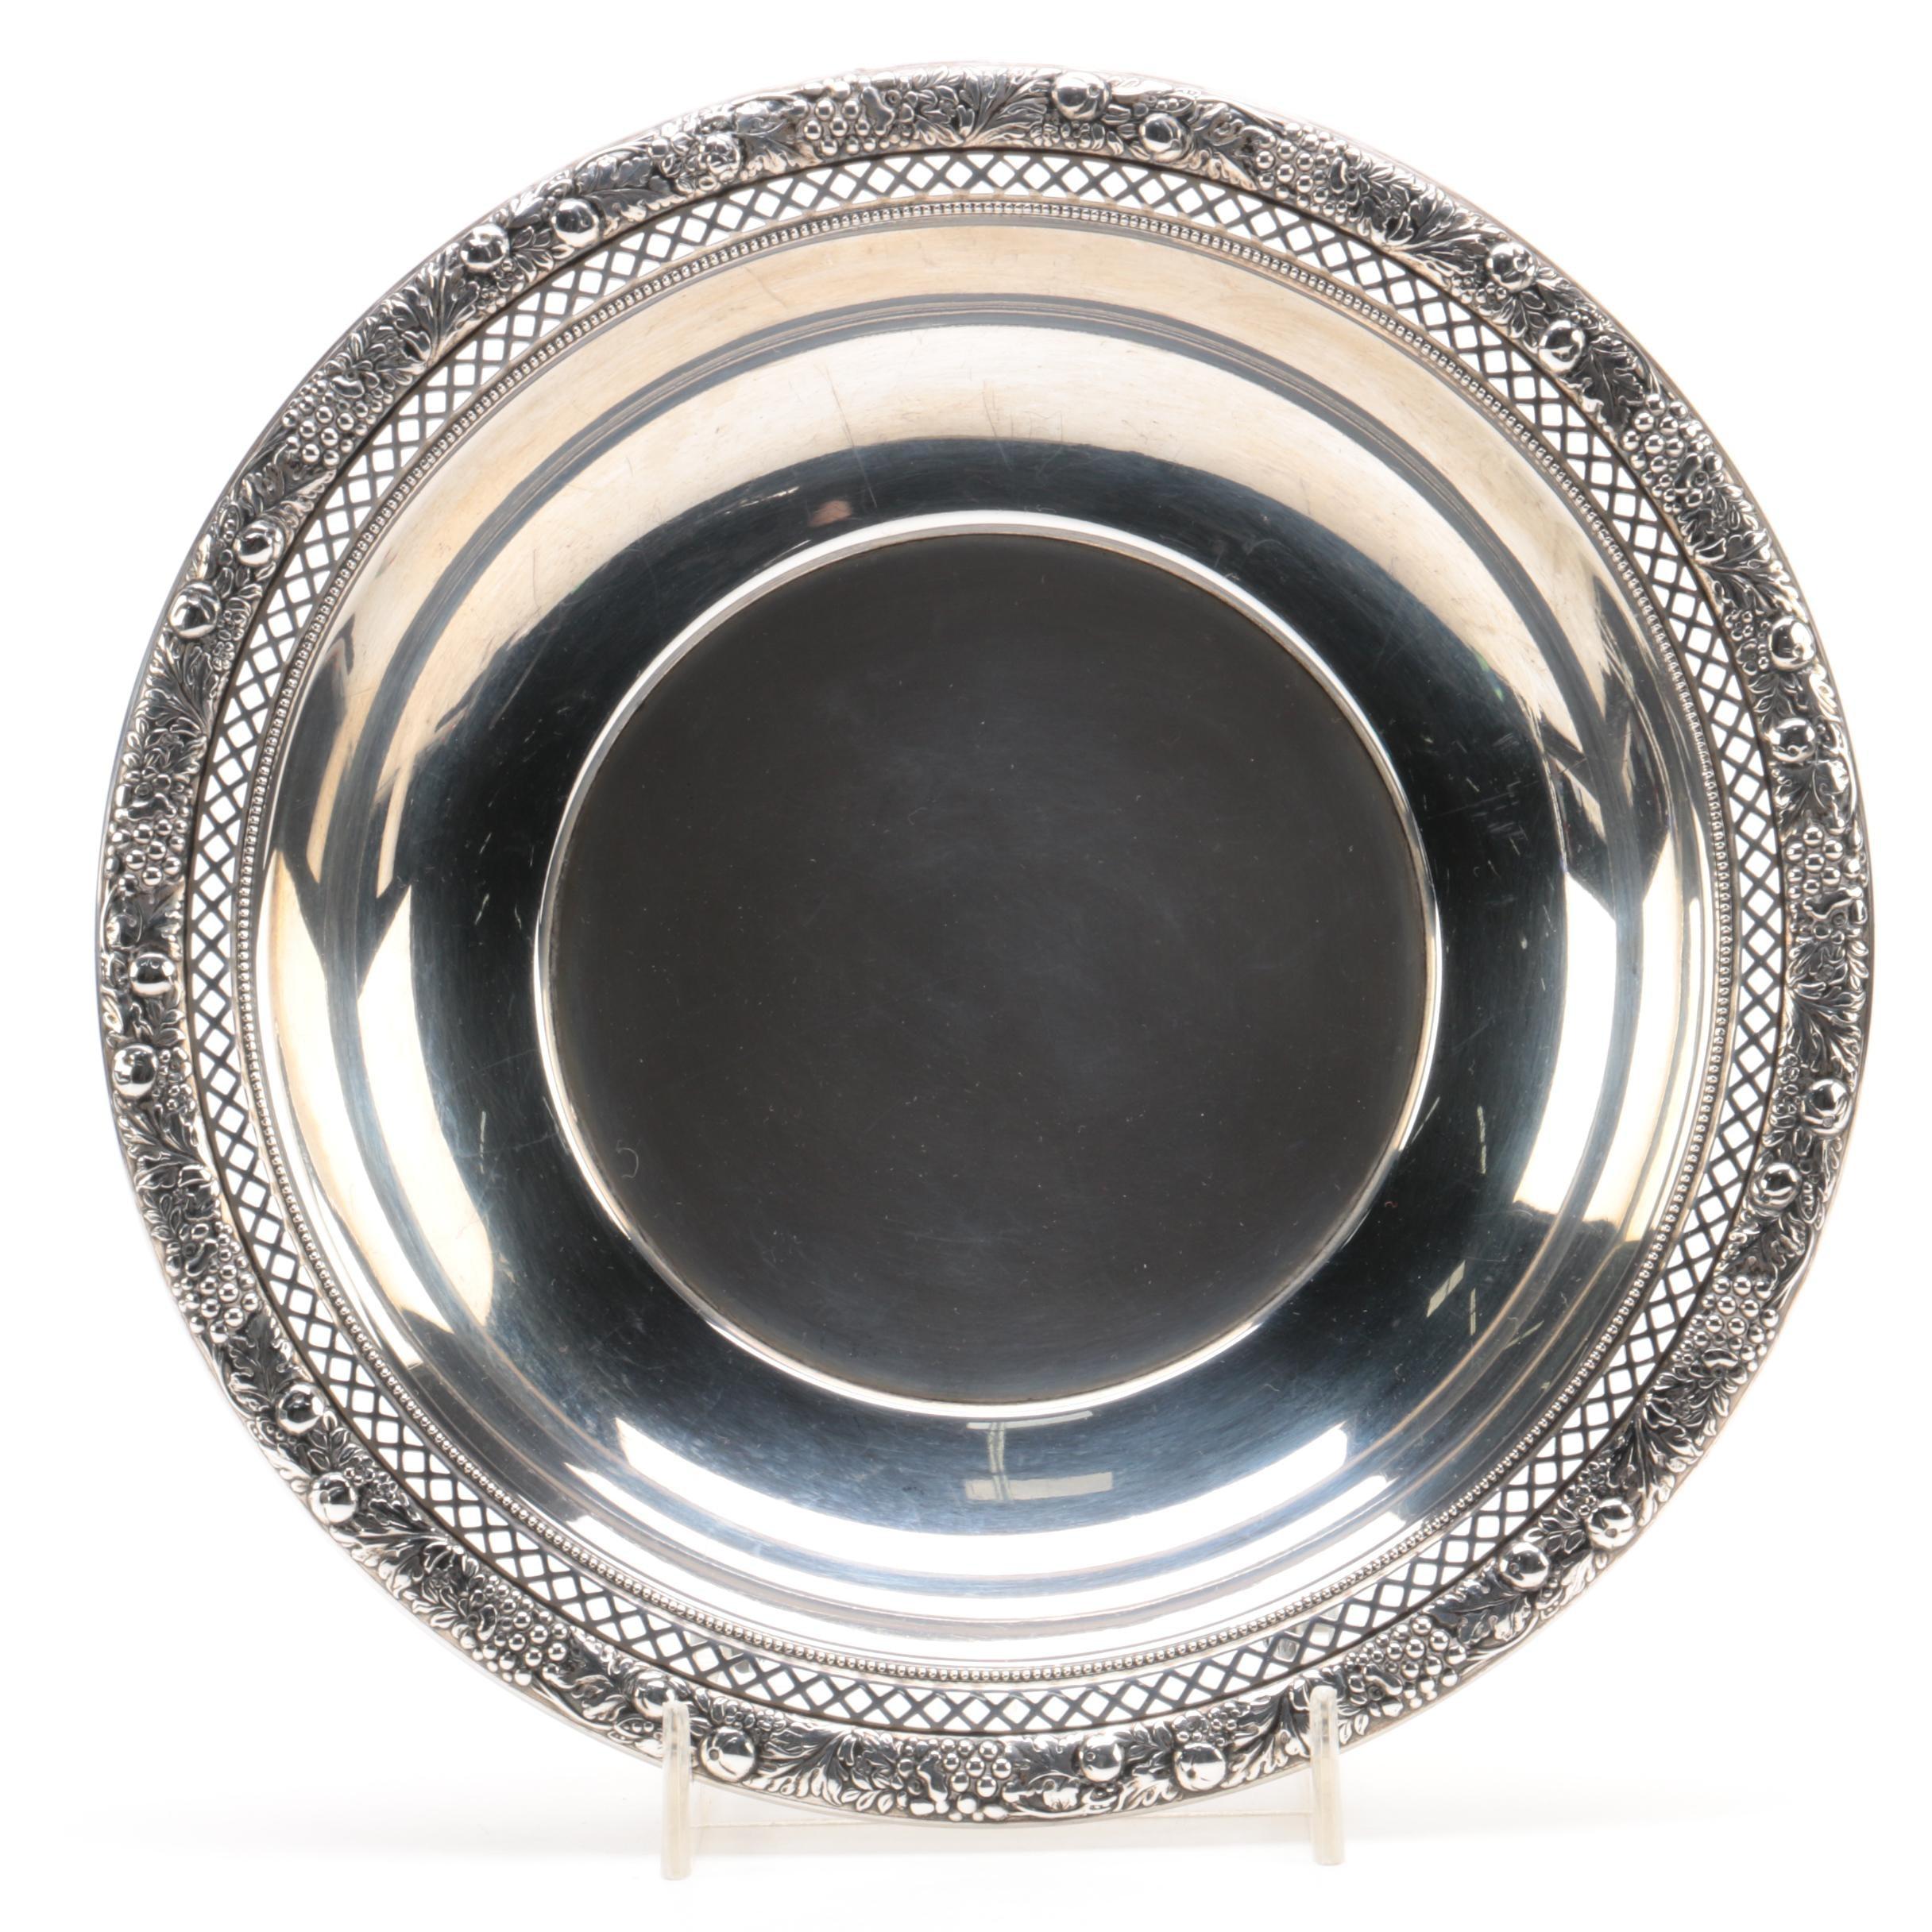 Lunt Silversmiths Pierced Rim Sterling Silver Bowl